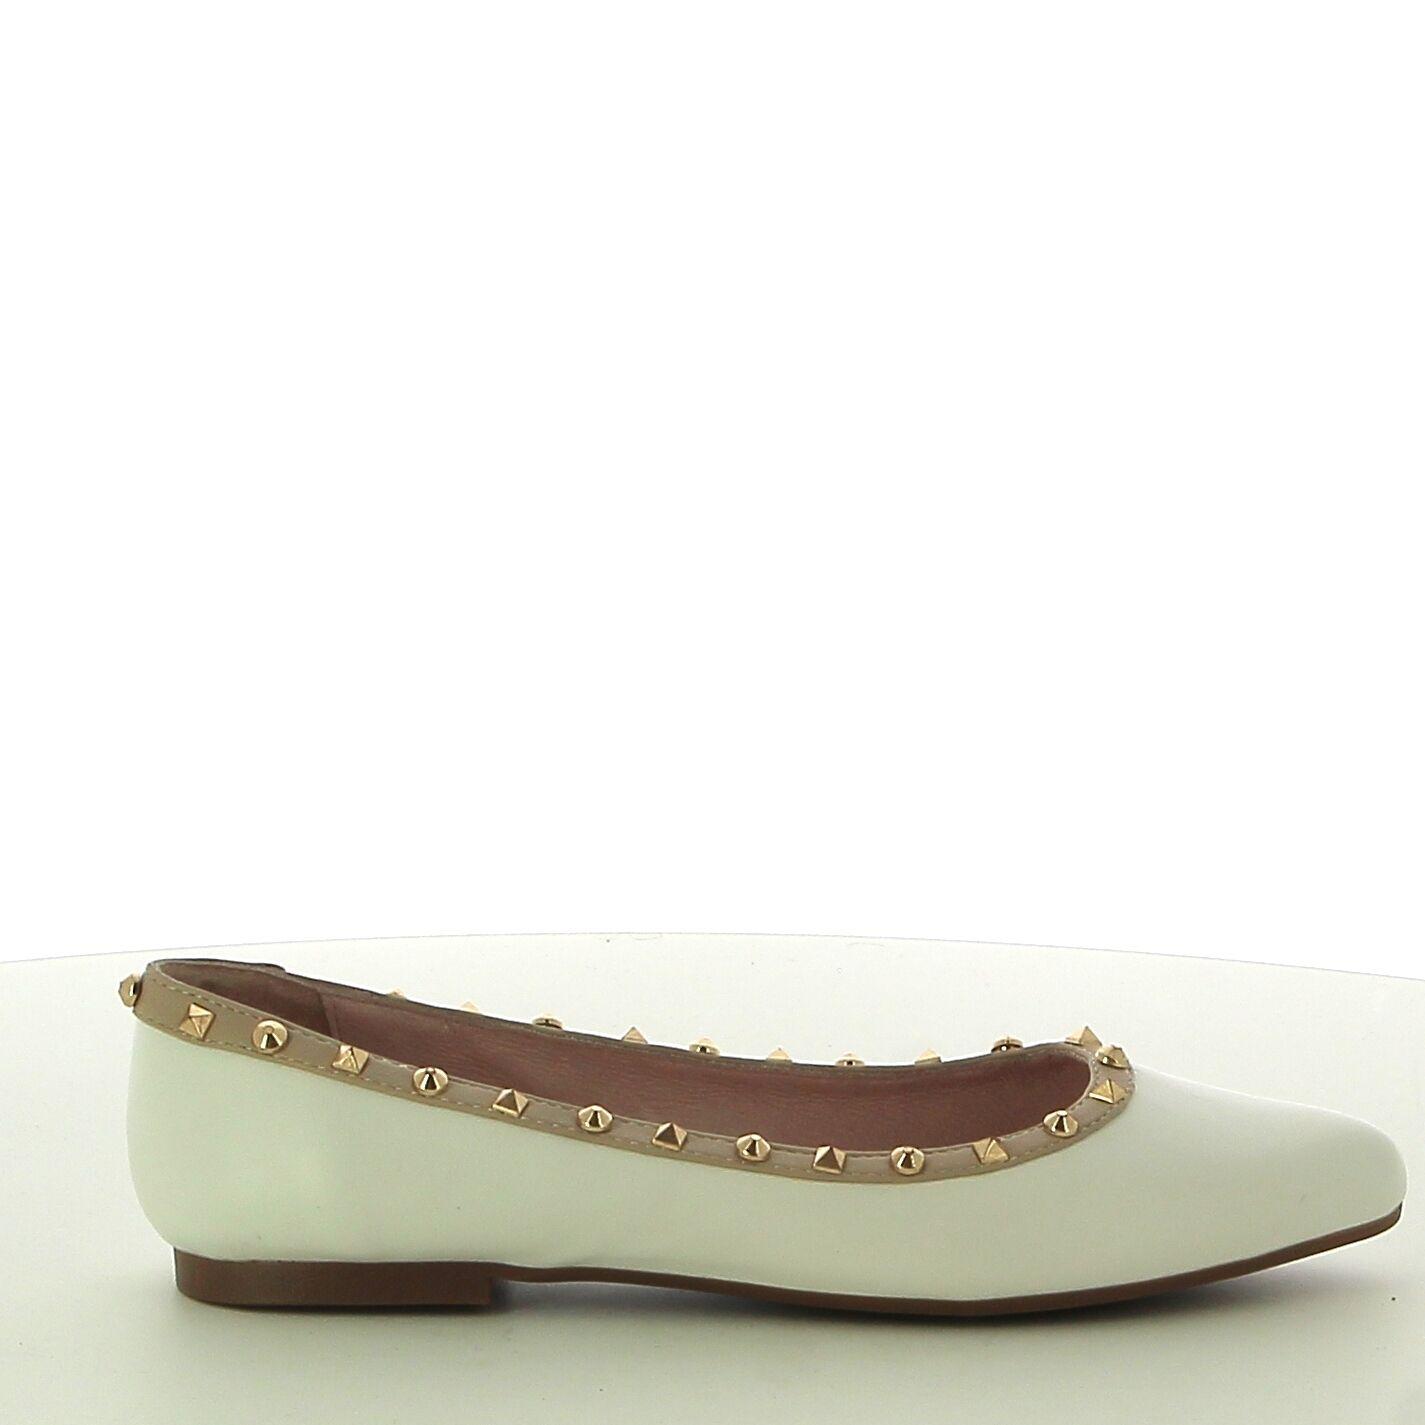 Ken Shoe Fashion - Ballerines - Blanc avec strass